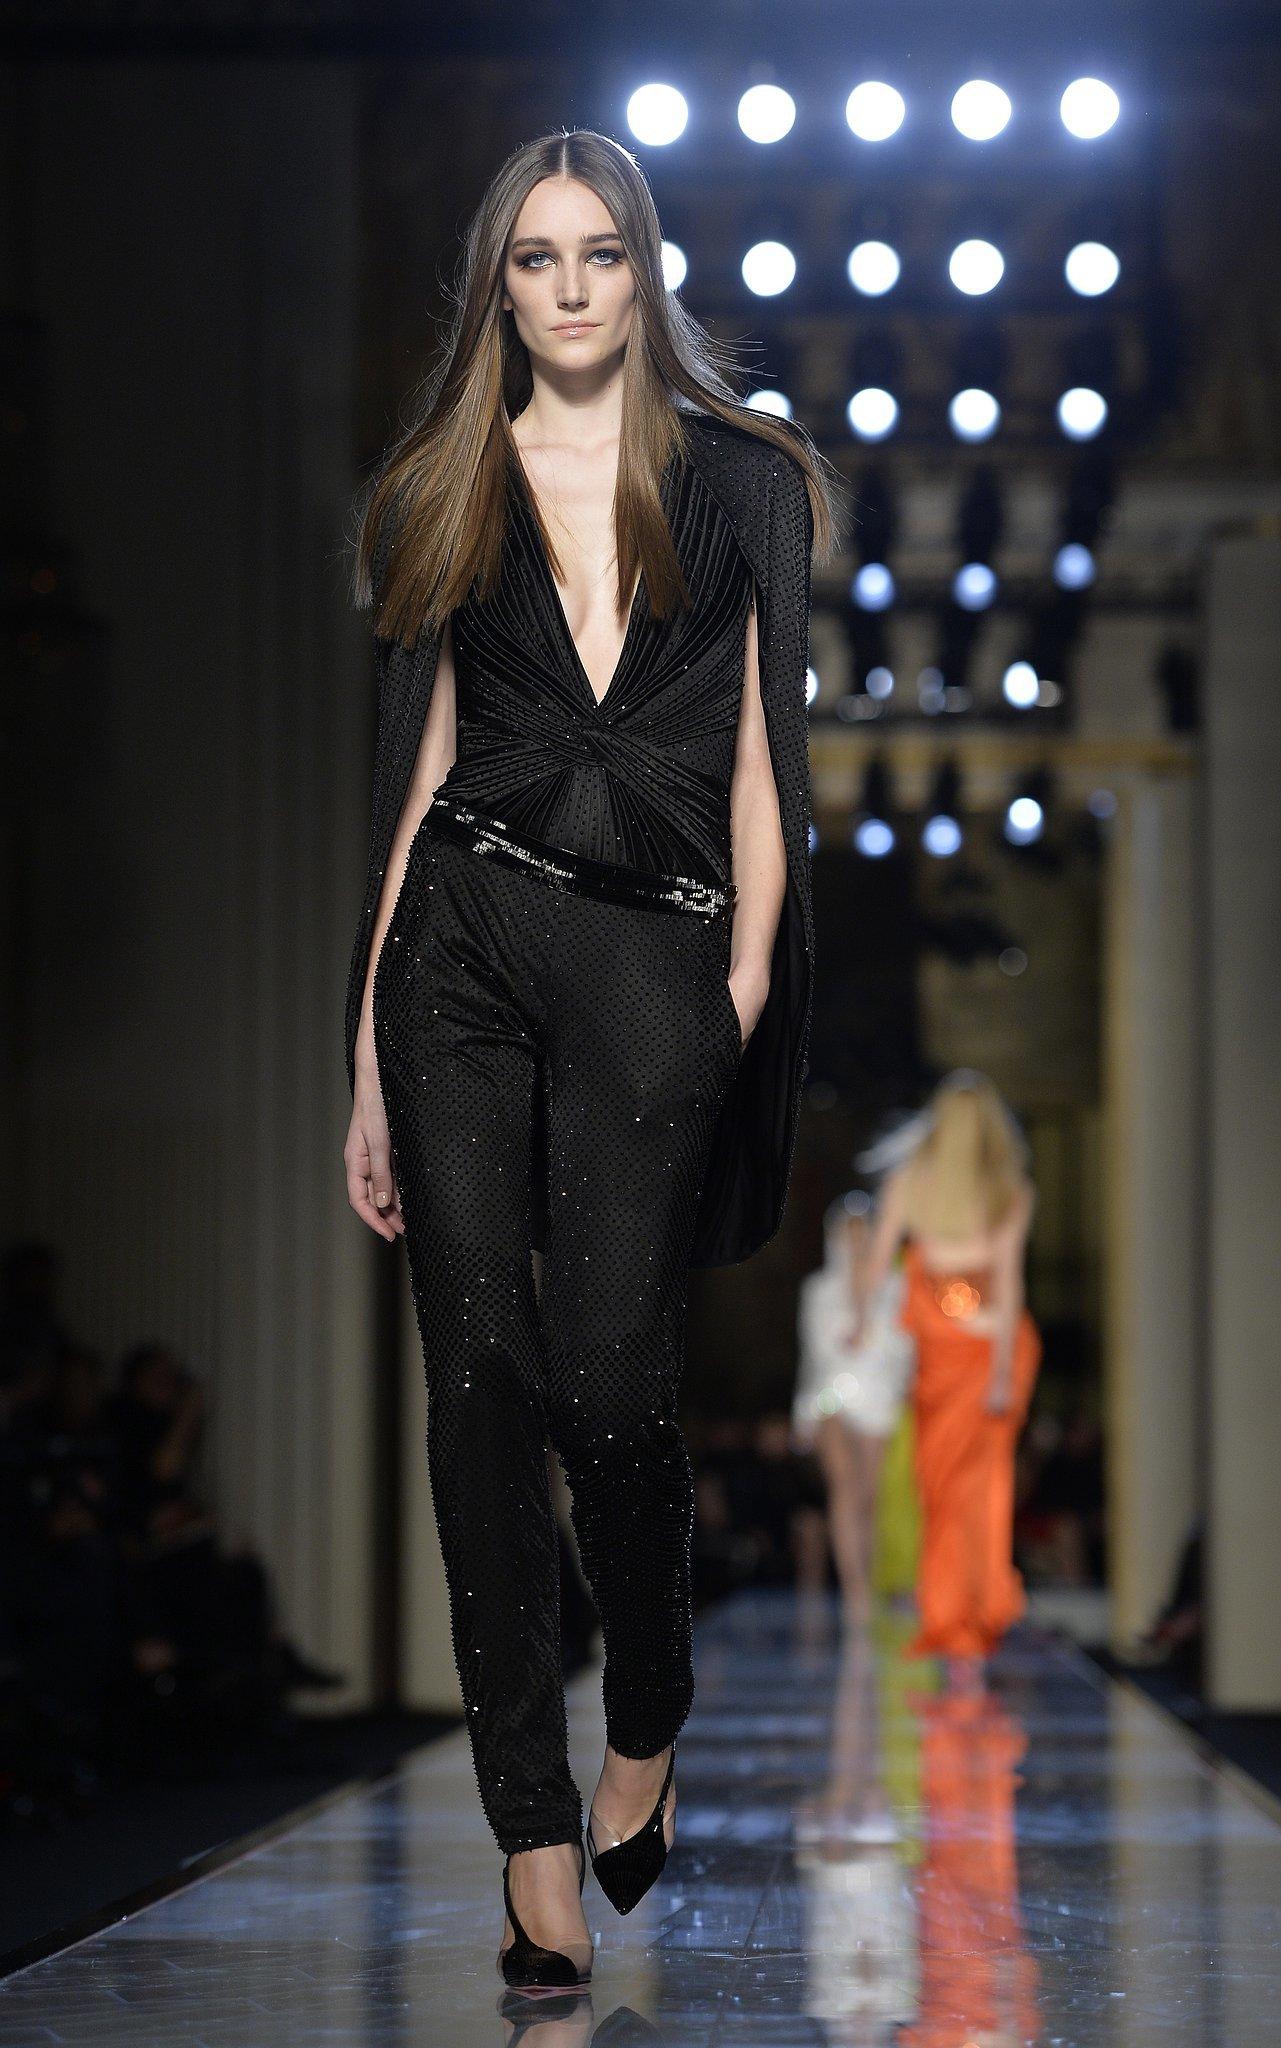 Atelier-Versace-Haute-Couture-Spring-2014-05